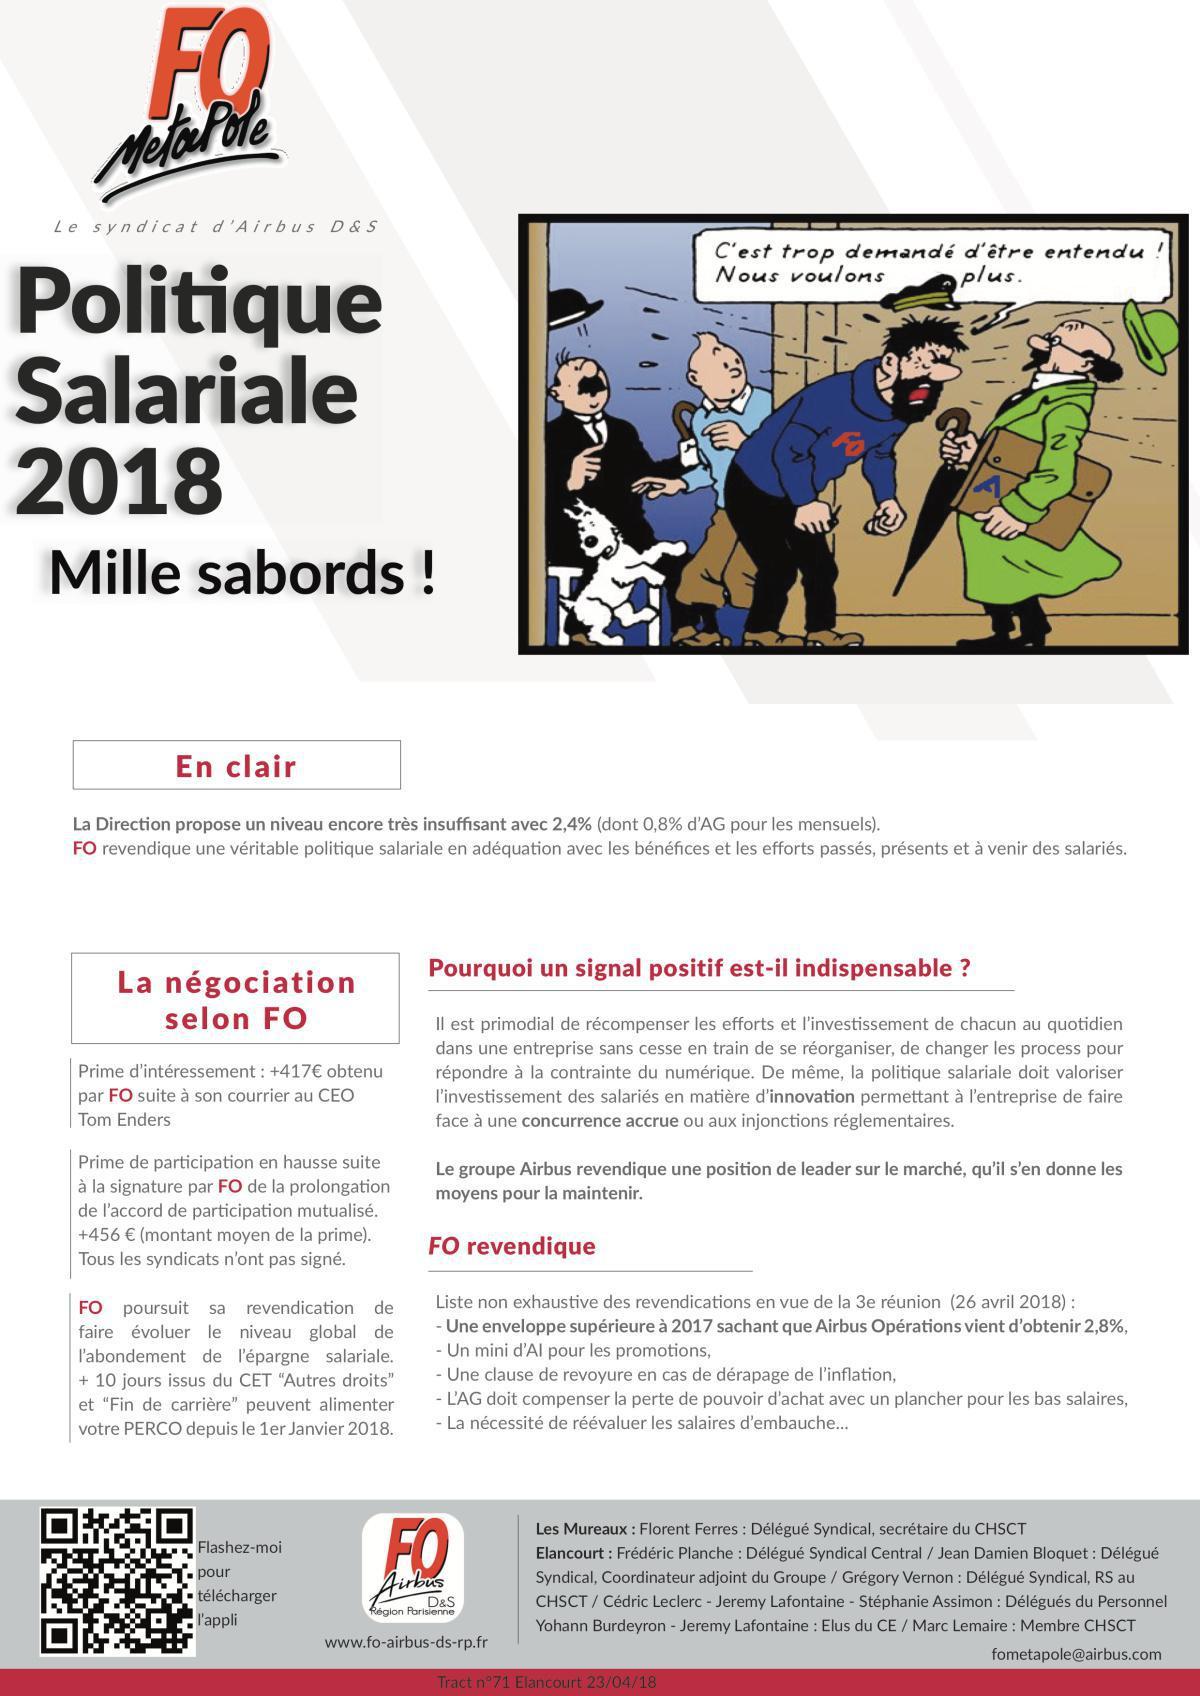 Politique Salariale 2018 : Mille sabords !